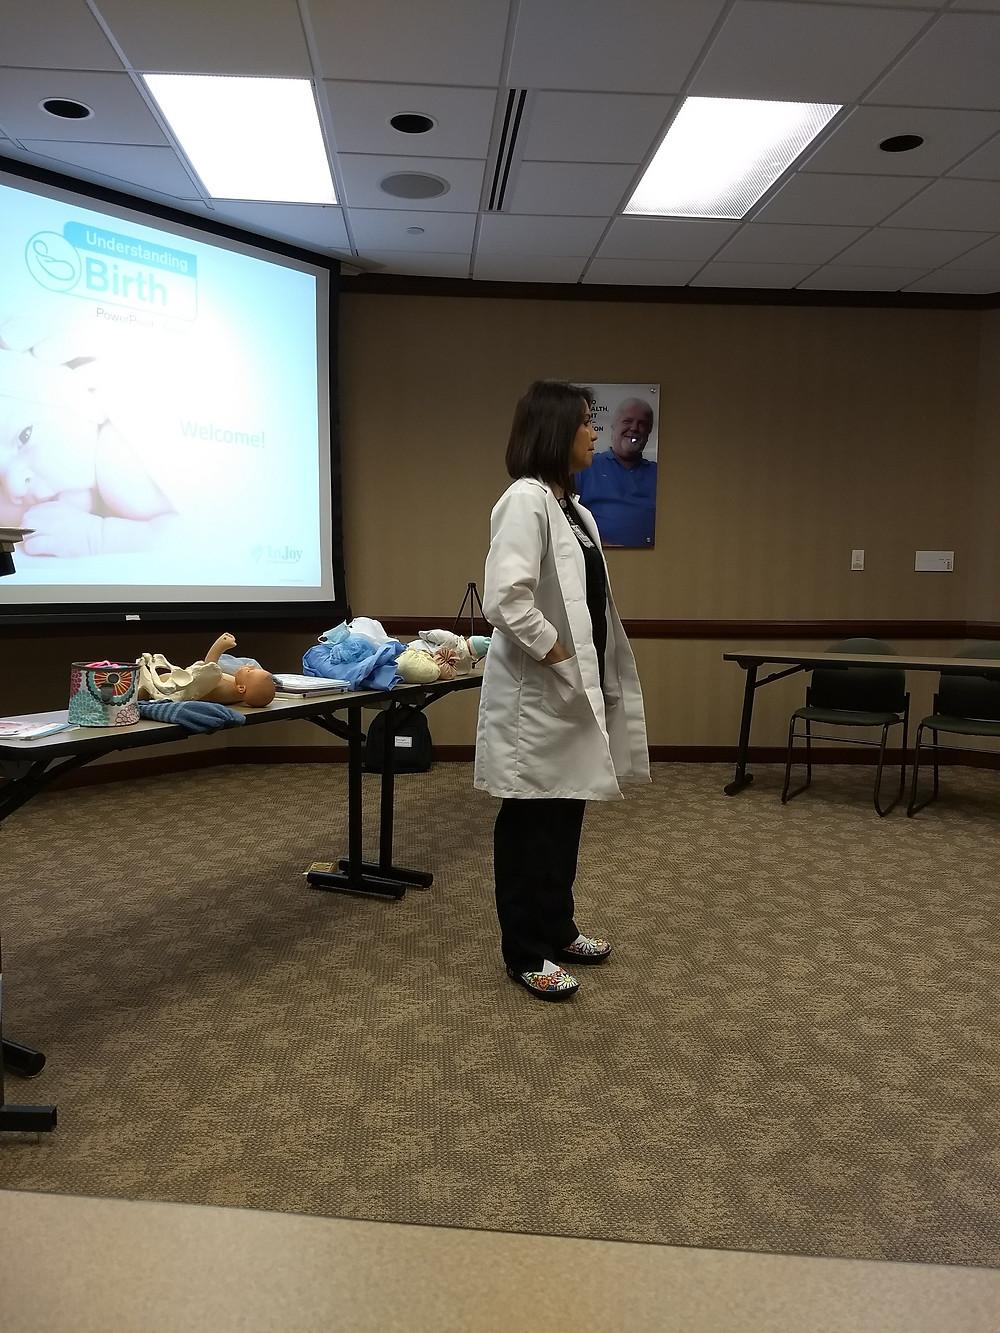 Childbirth educator teaching